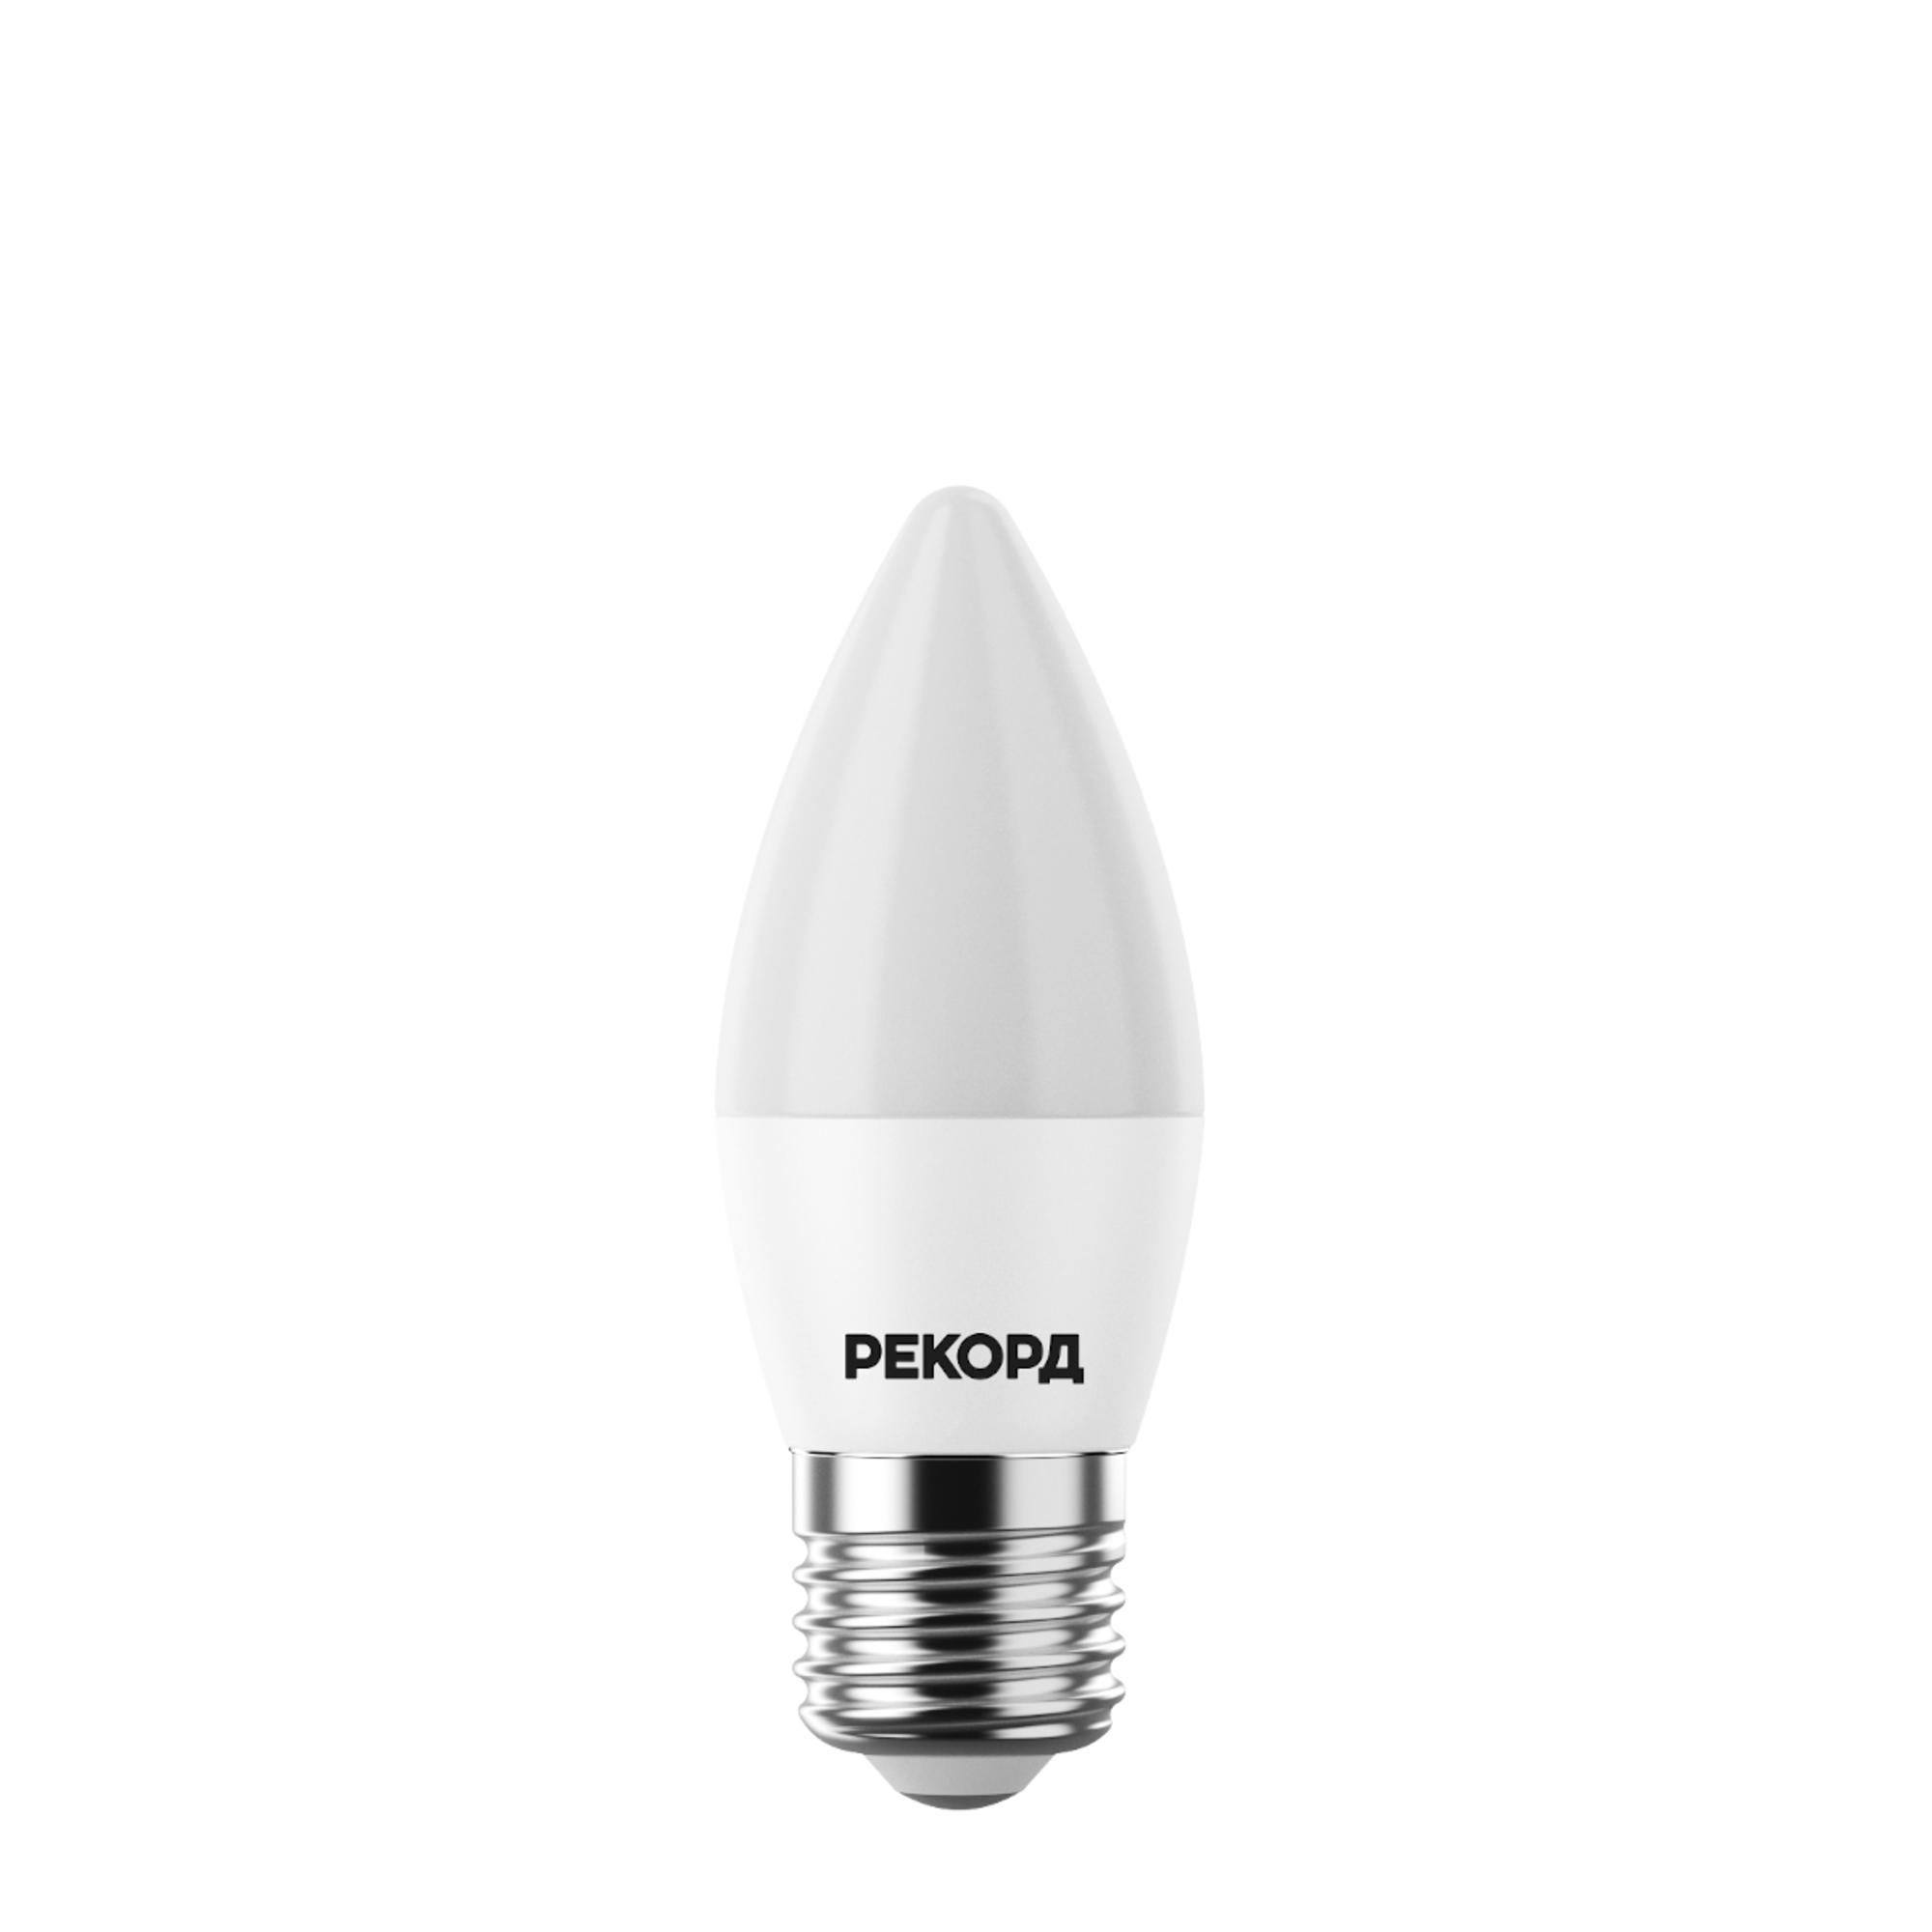 Светодиодная лампочка Рекорд 23882 E27 70 Лм 7 Вт